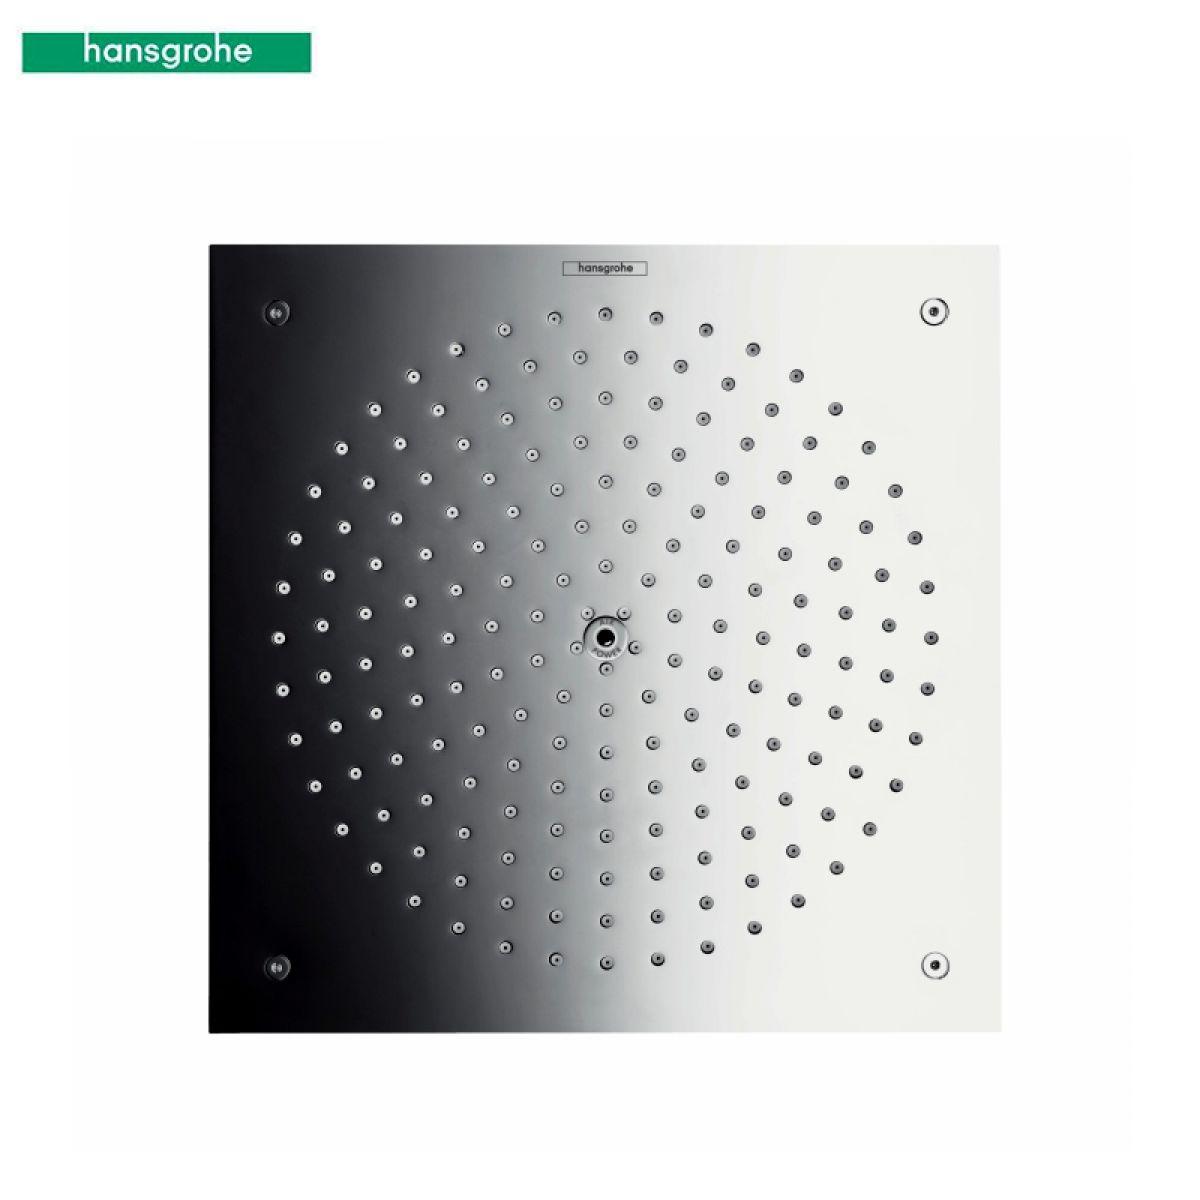 hansgrohe raindance air overhead shower 260 x 260mm uk. Black Bedroom Furniture Sets. Home Design Ideas